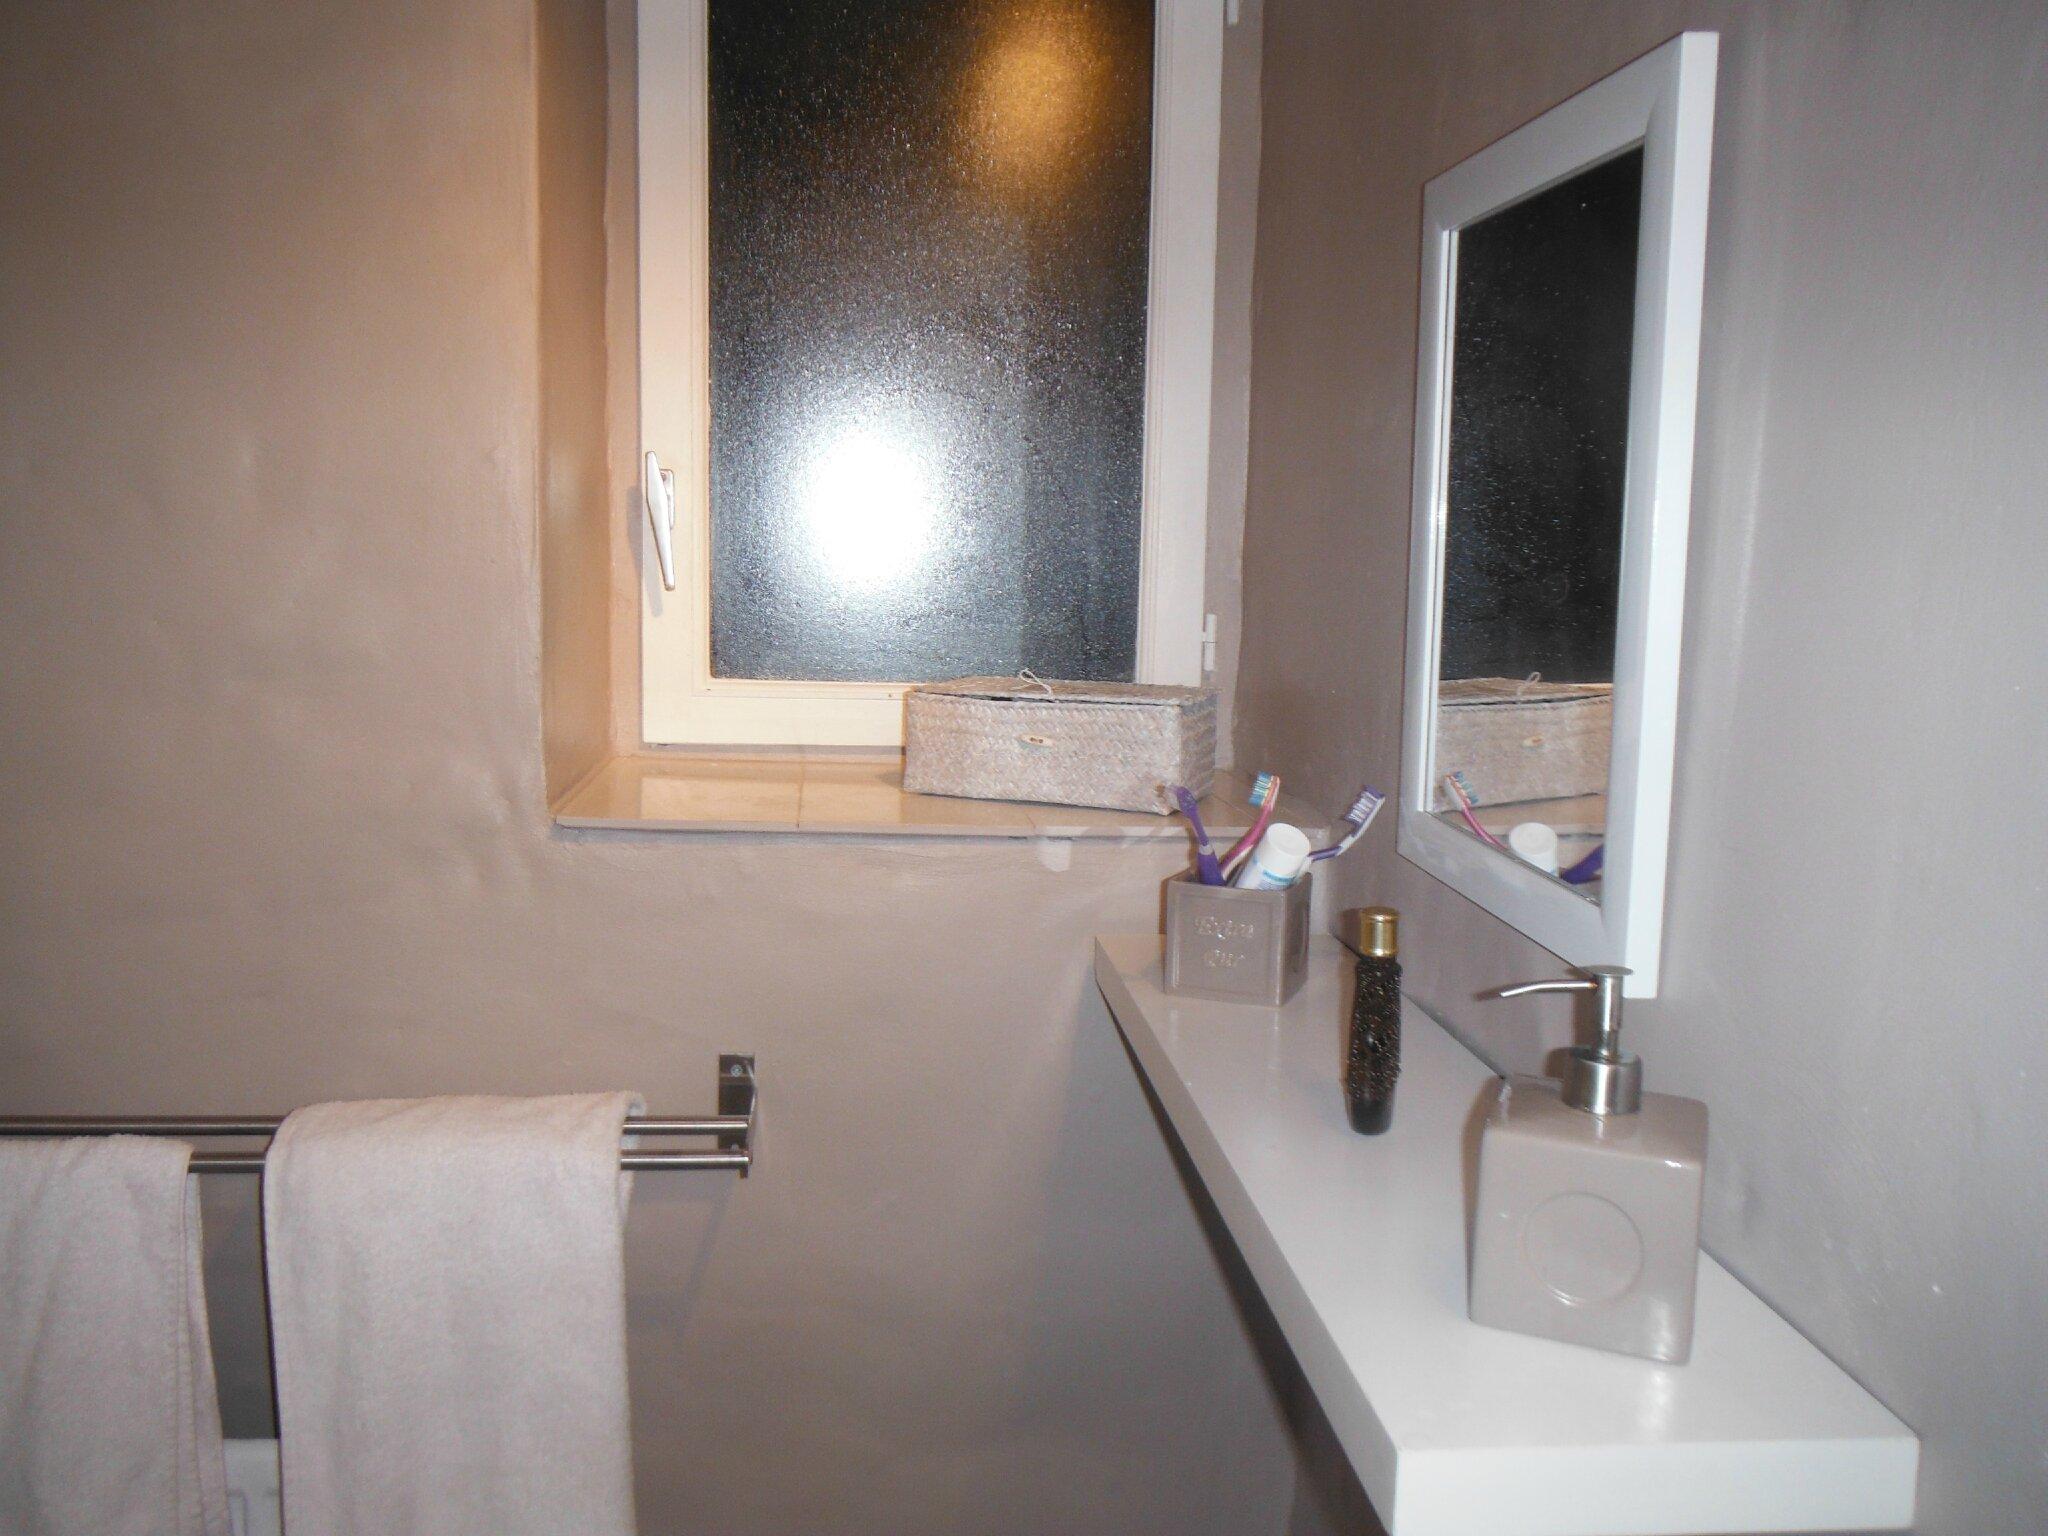 Ambiance salle de bain retro for Carrelage marron salle de bain